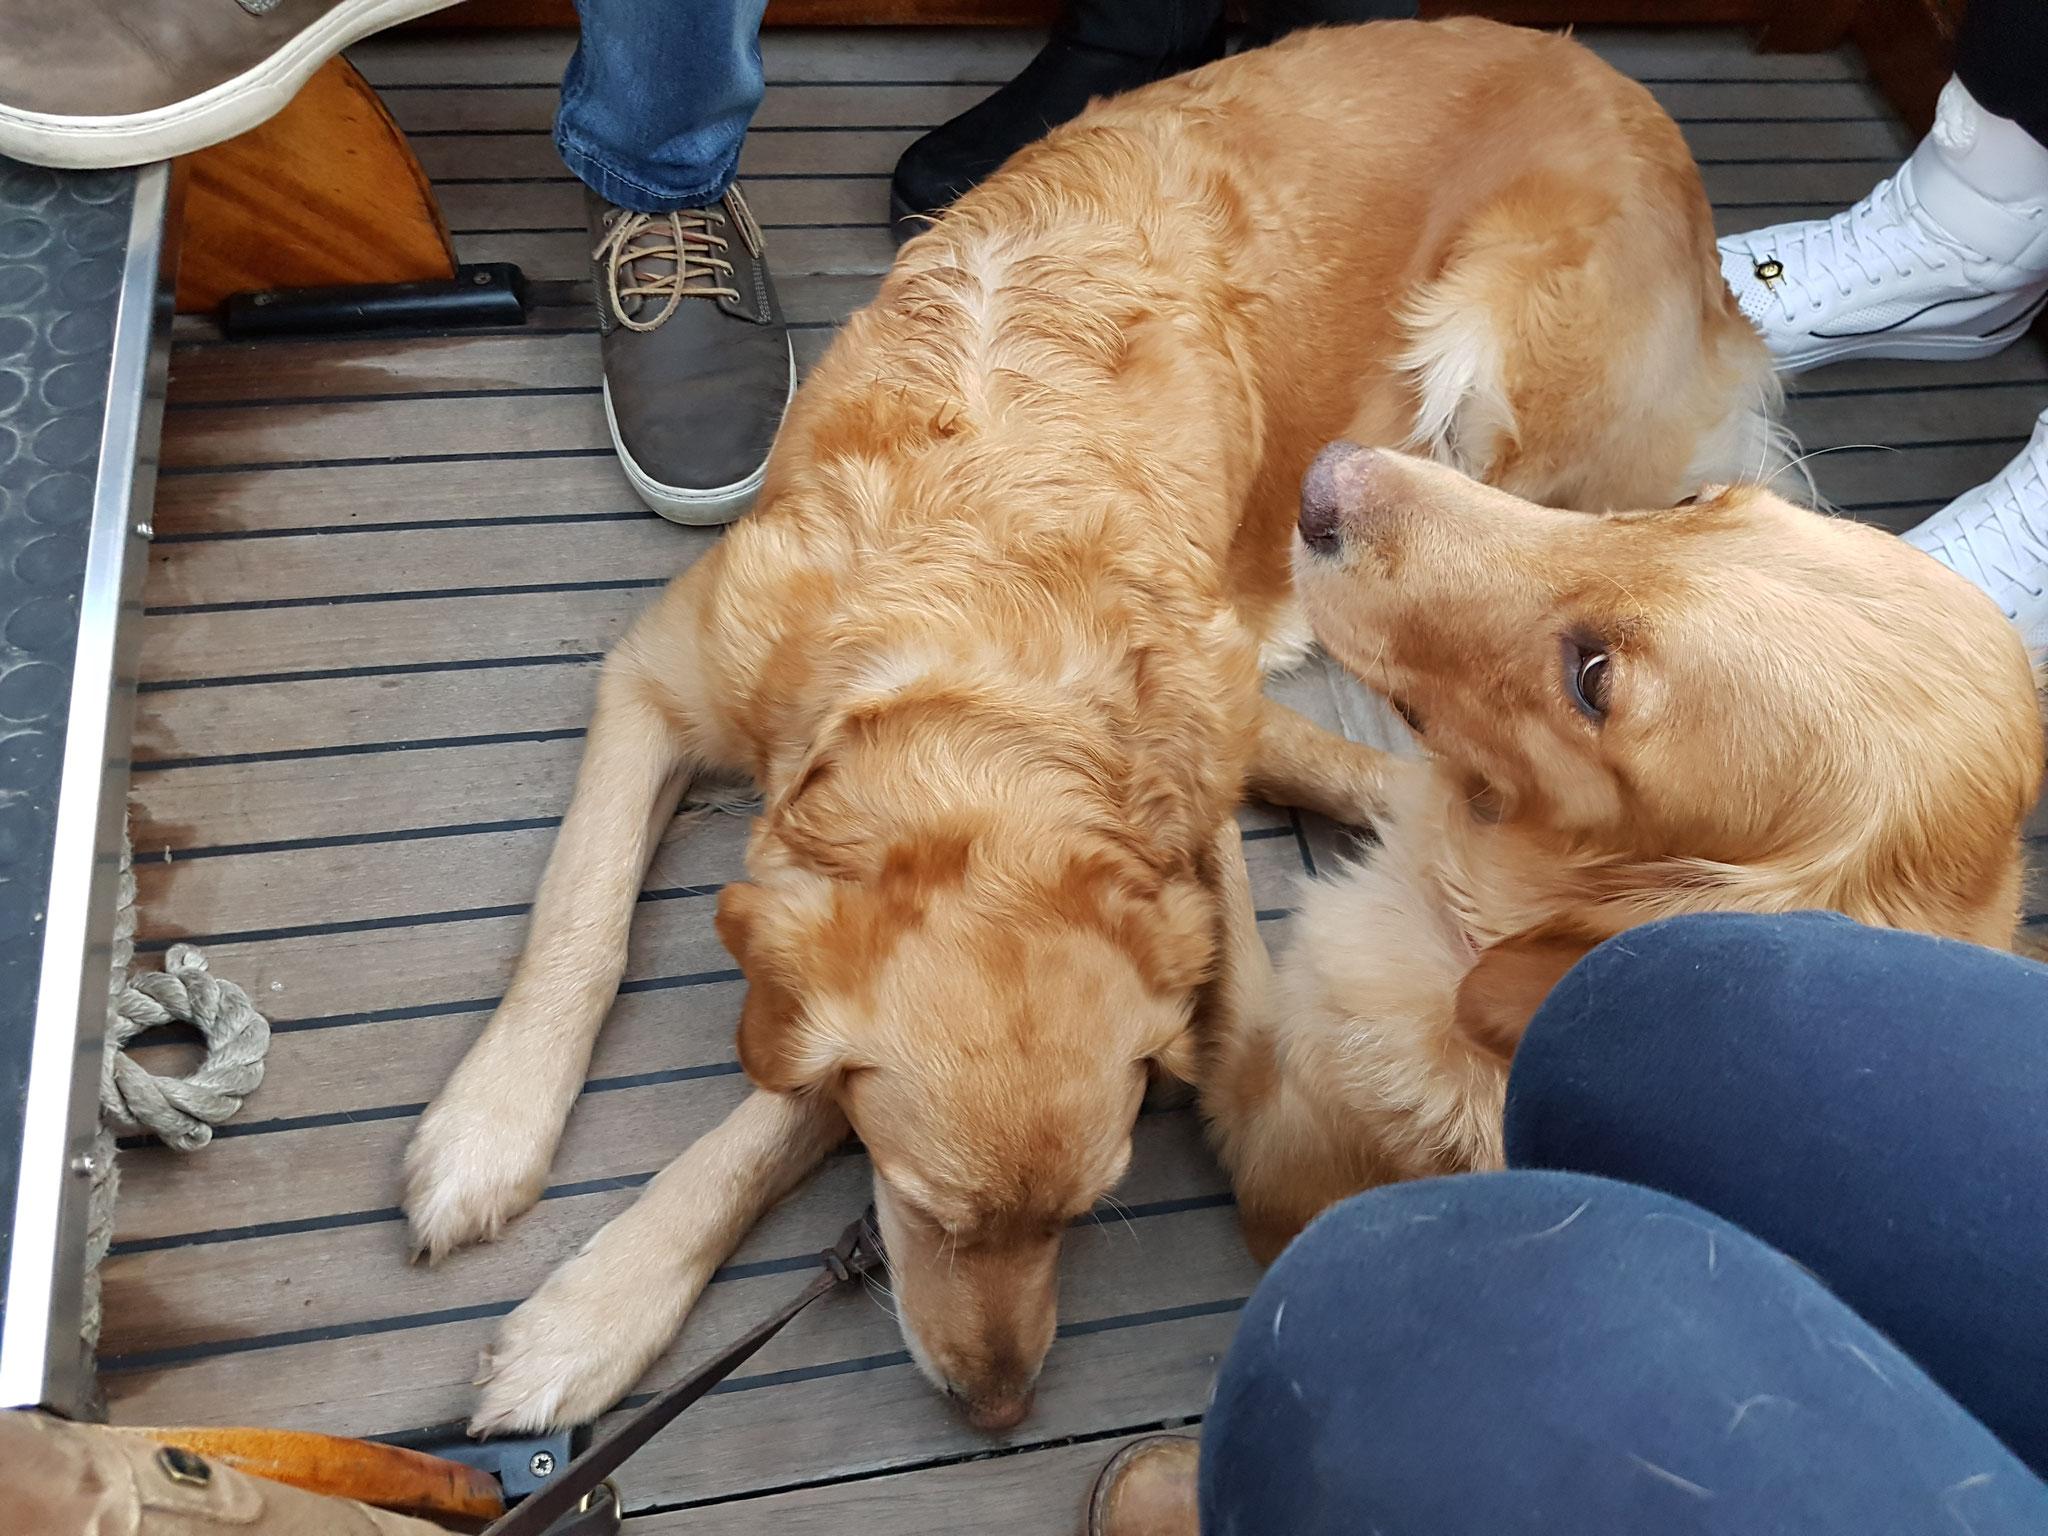 völlig relaxed haben die Hunde alles mitgemacht